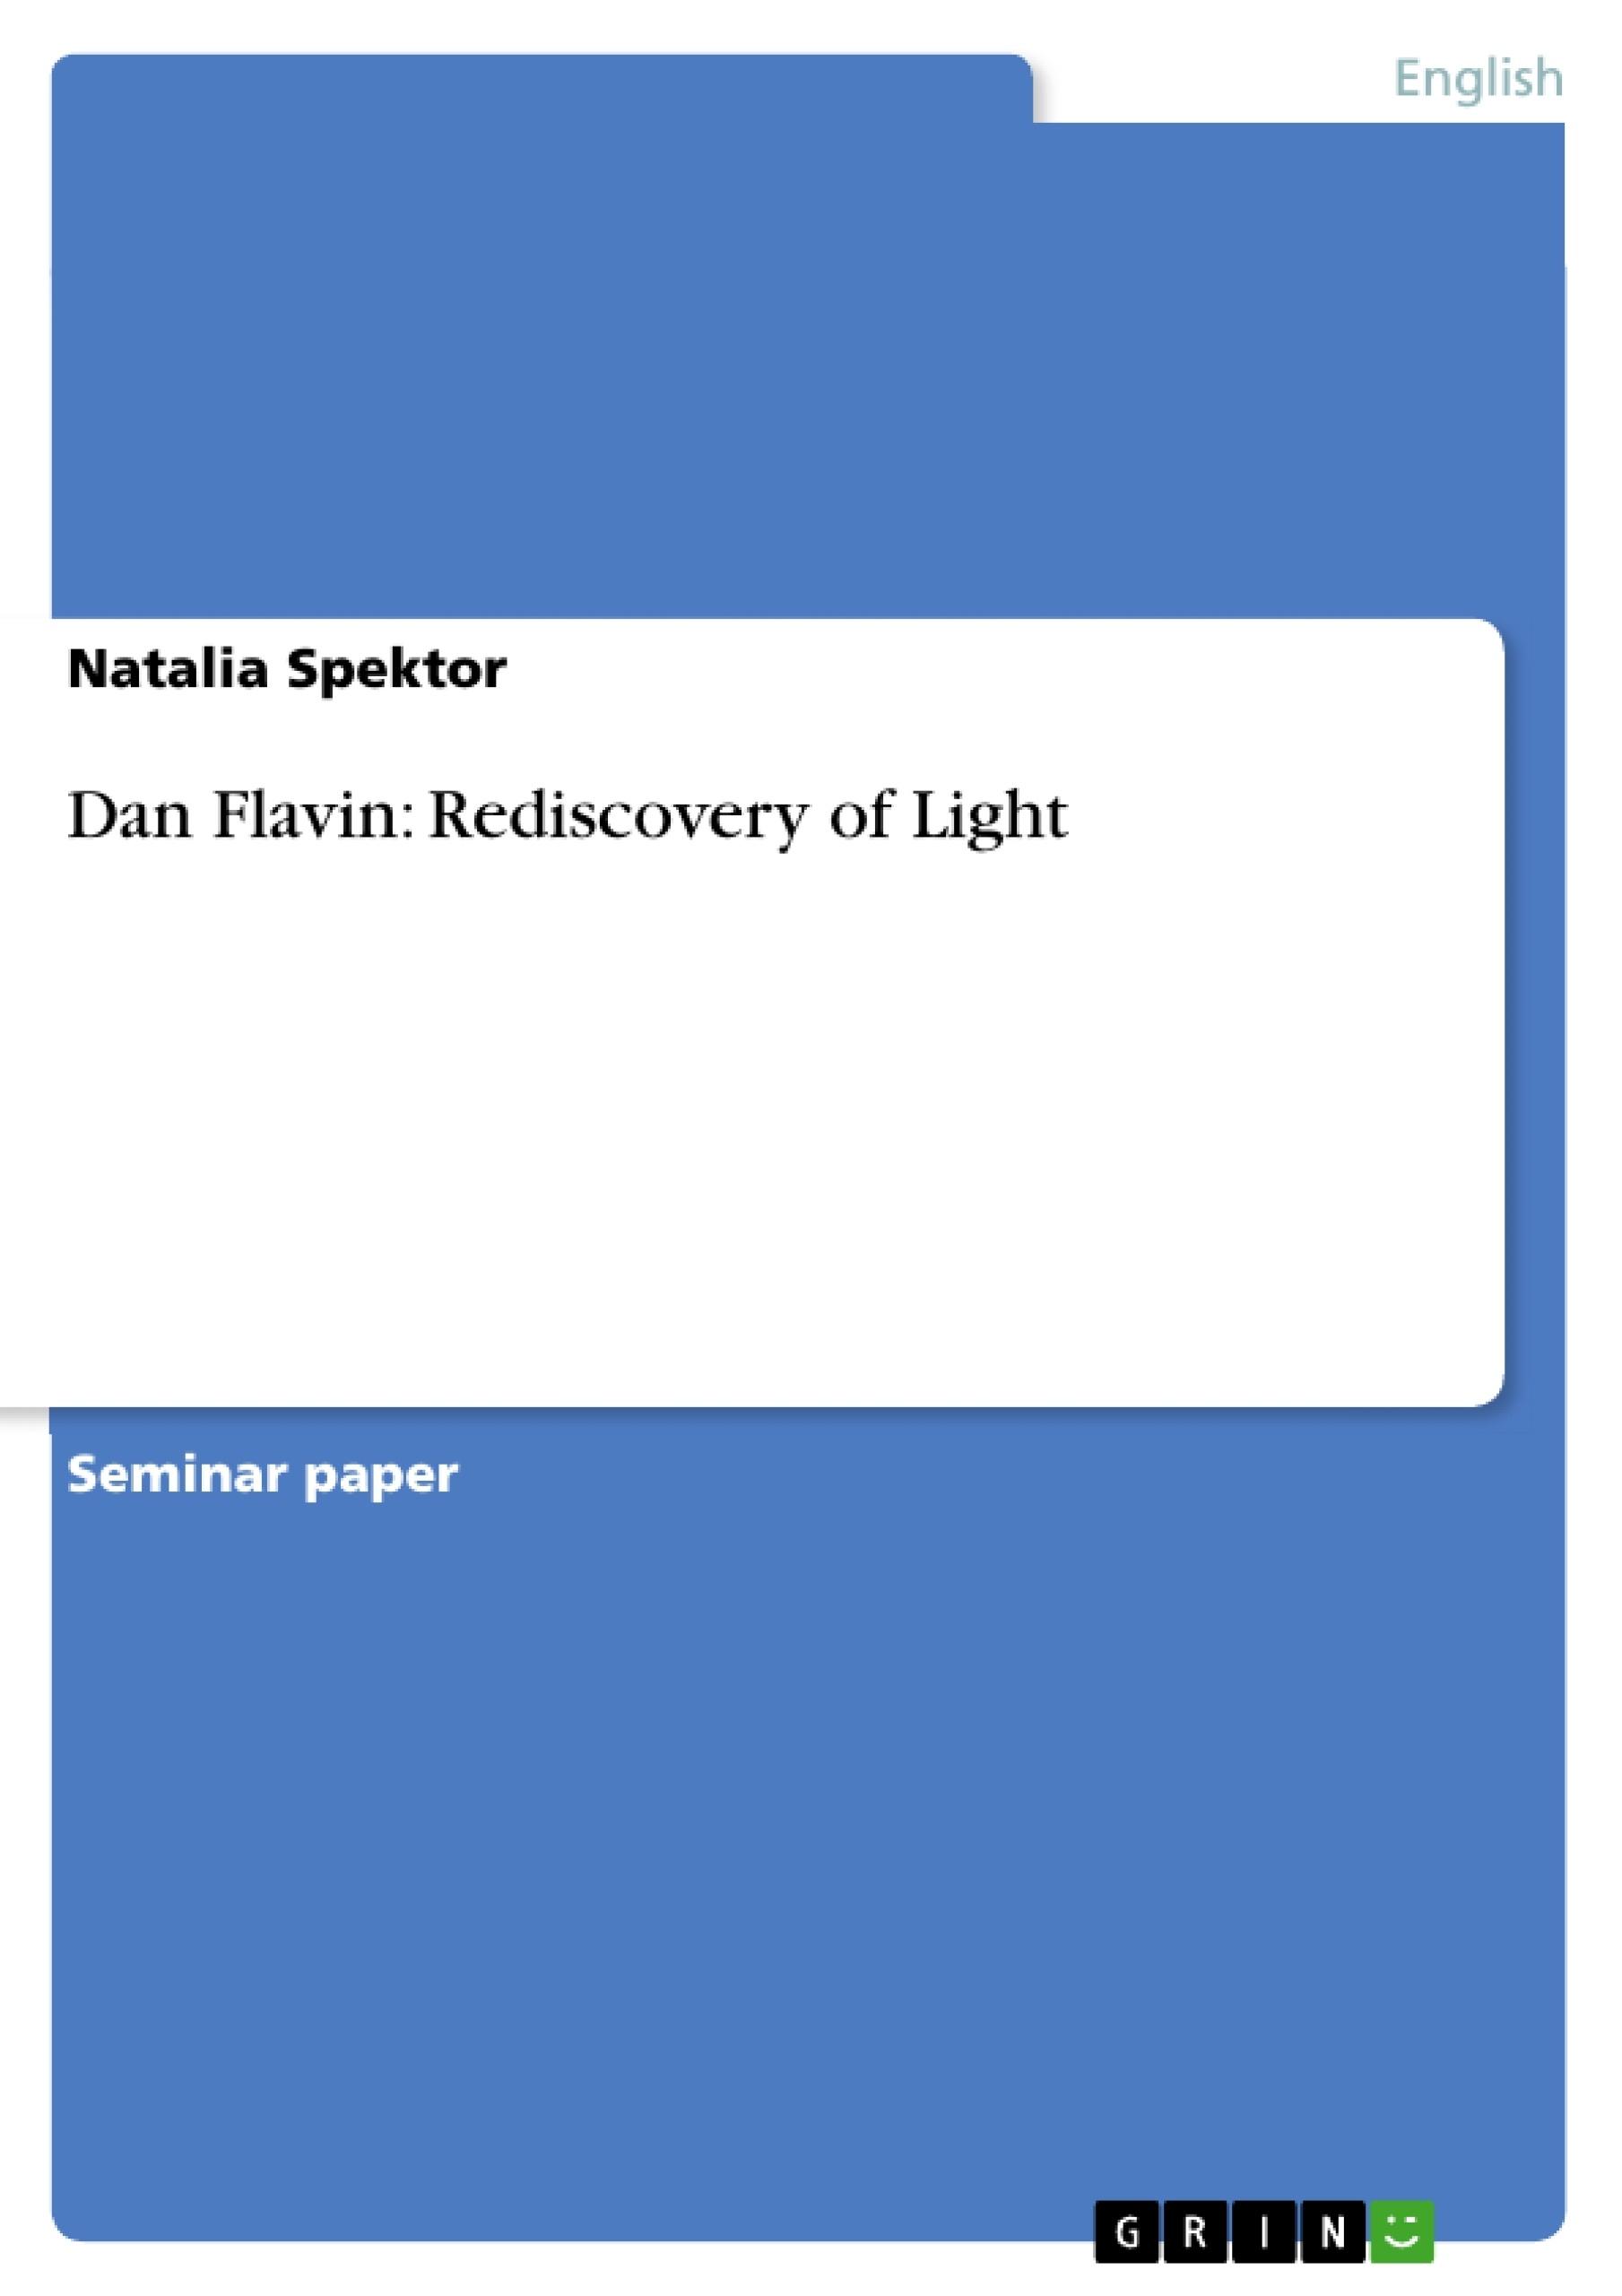 Title: Dan Flavin: Rediscovery of Light